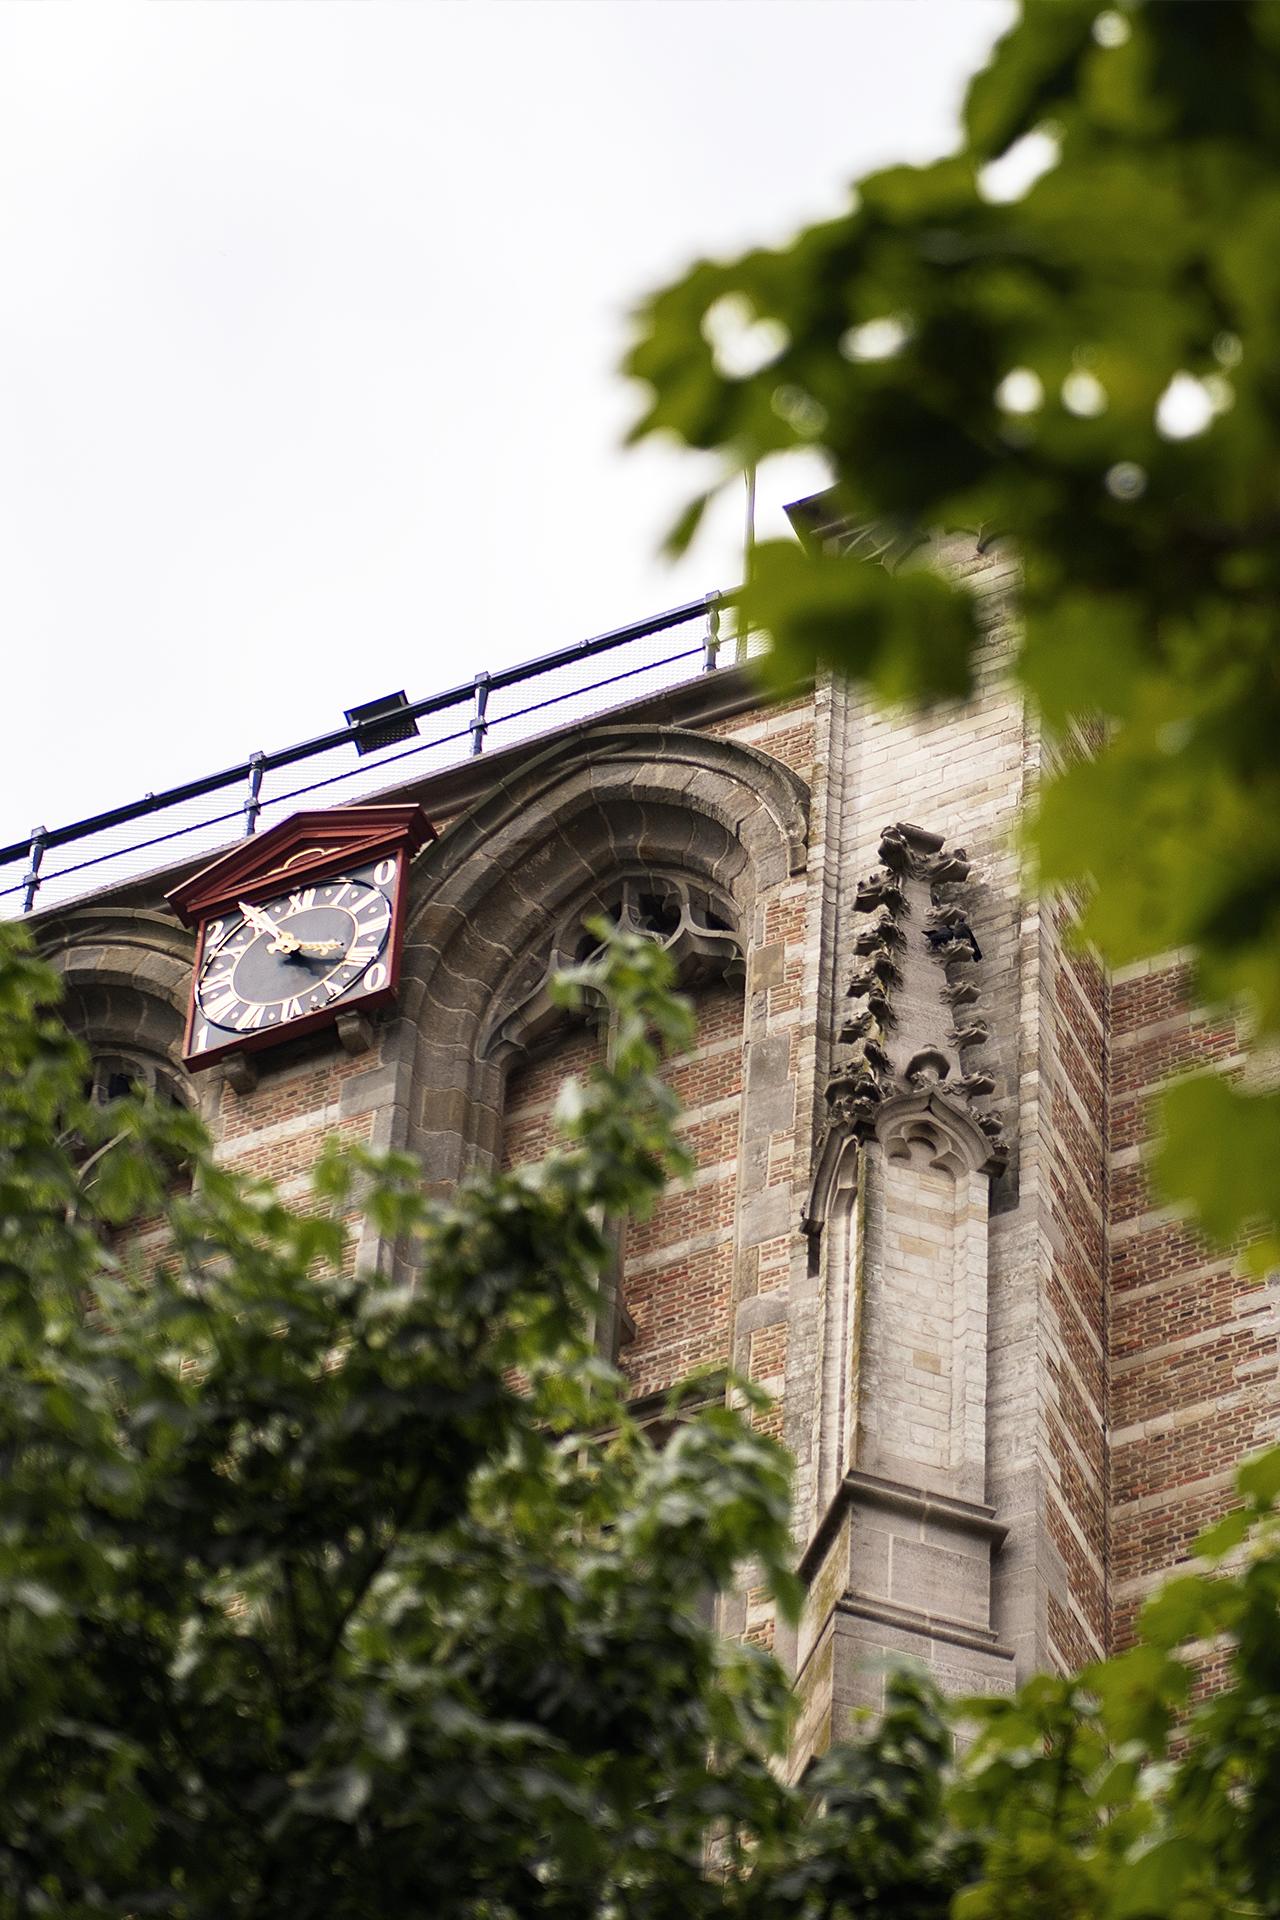 Toren Catharinakerk in Goedereede